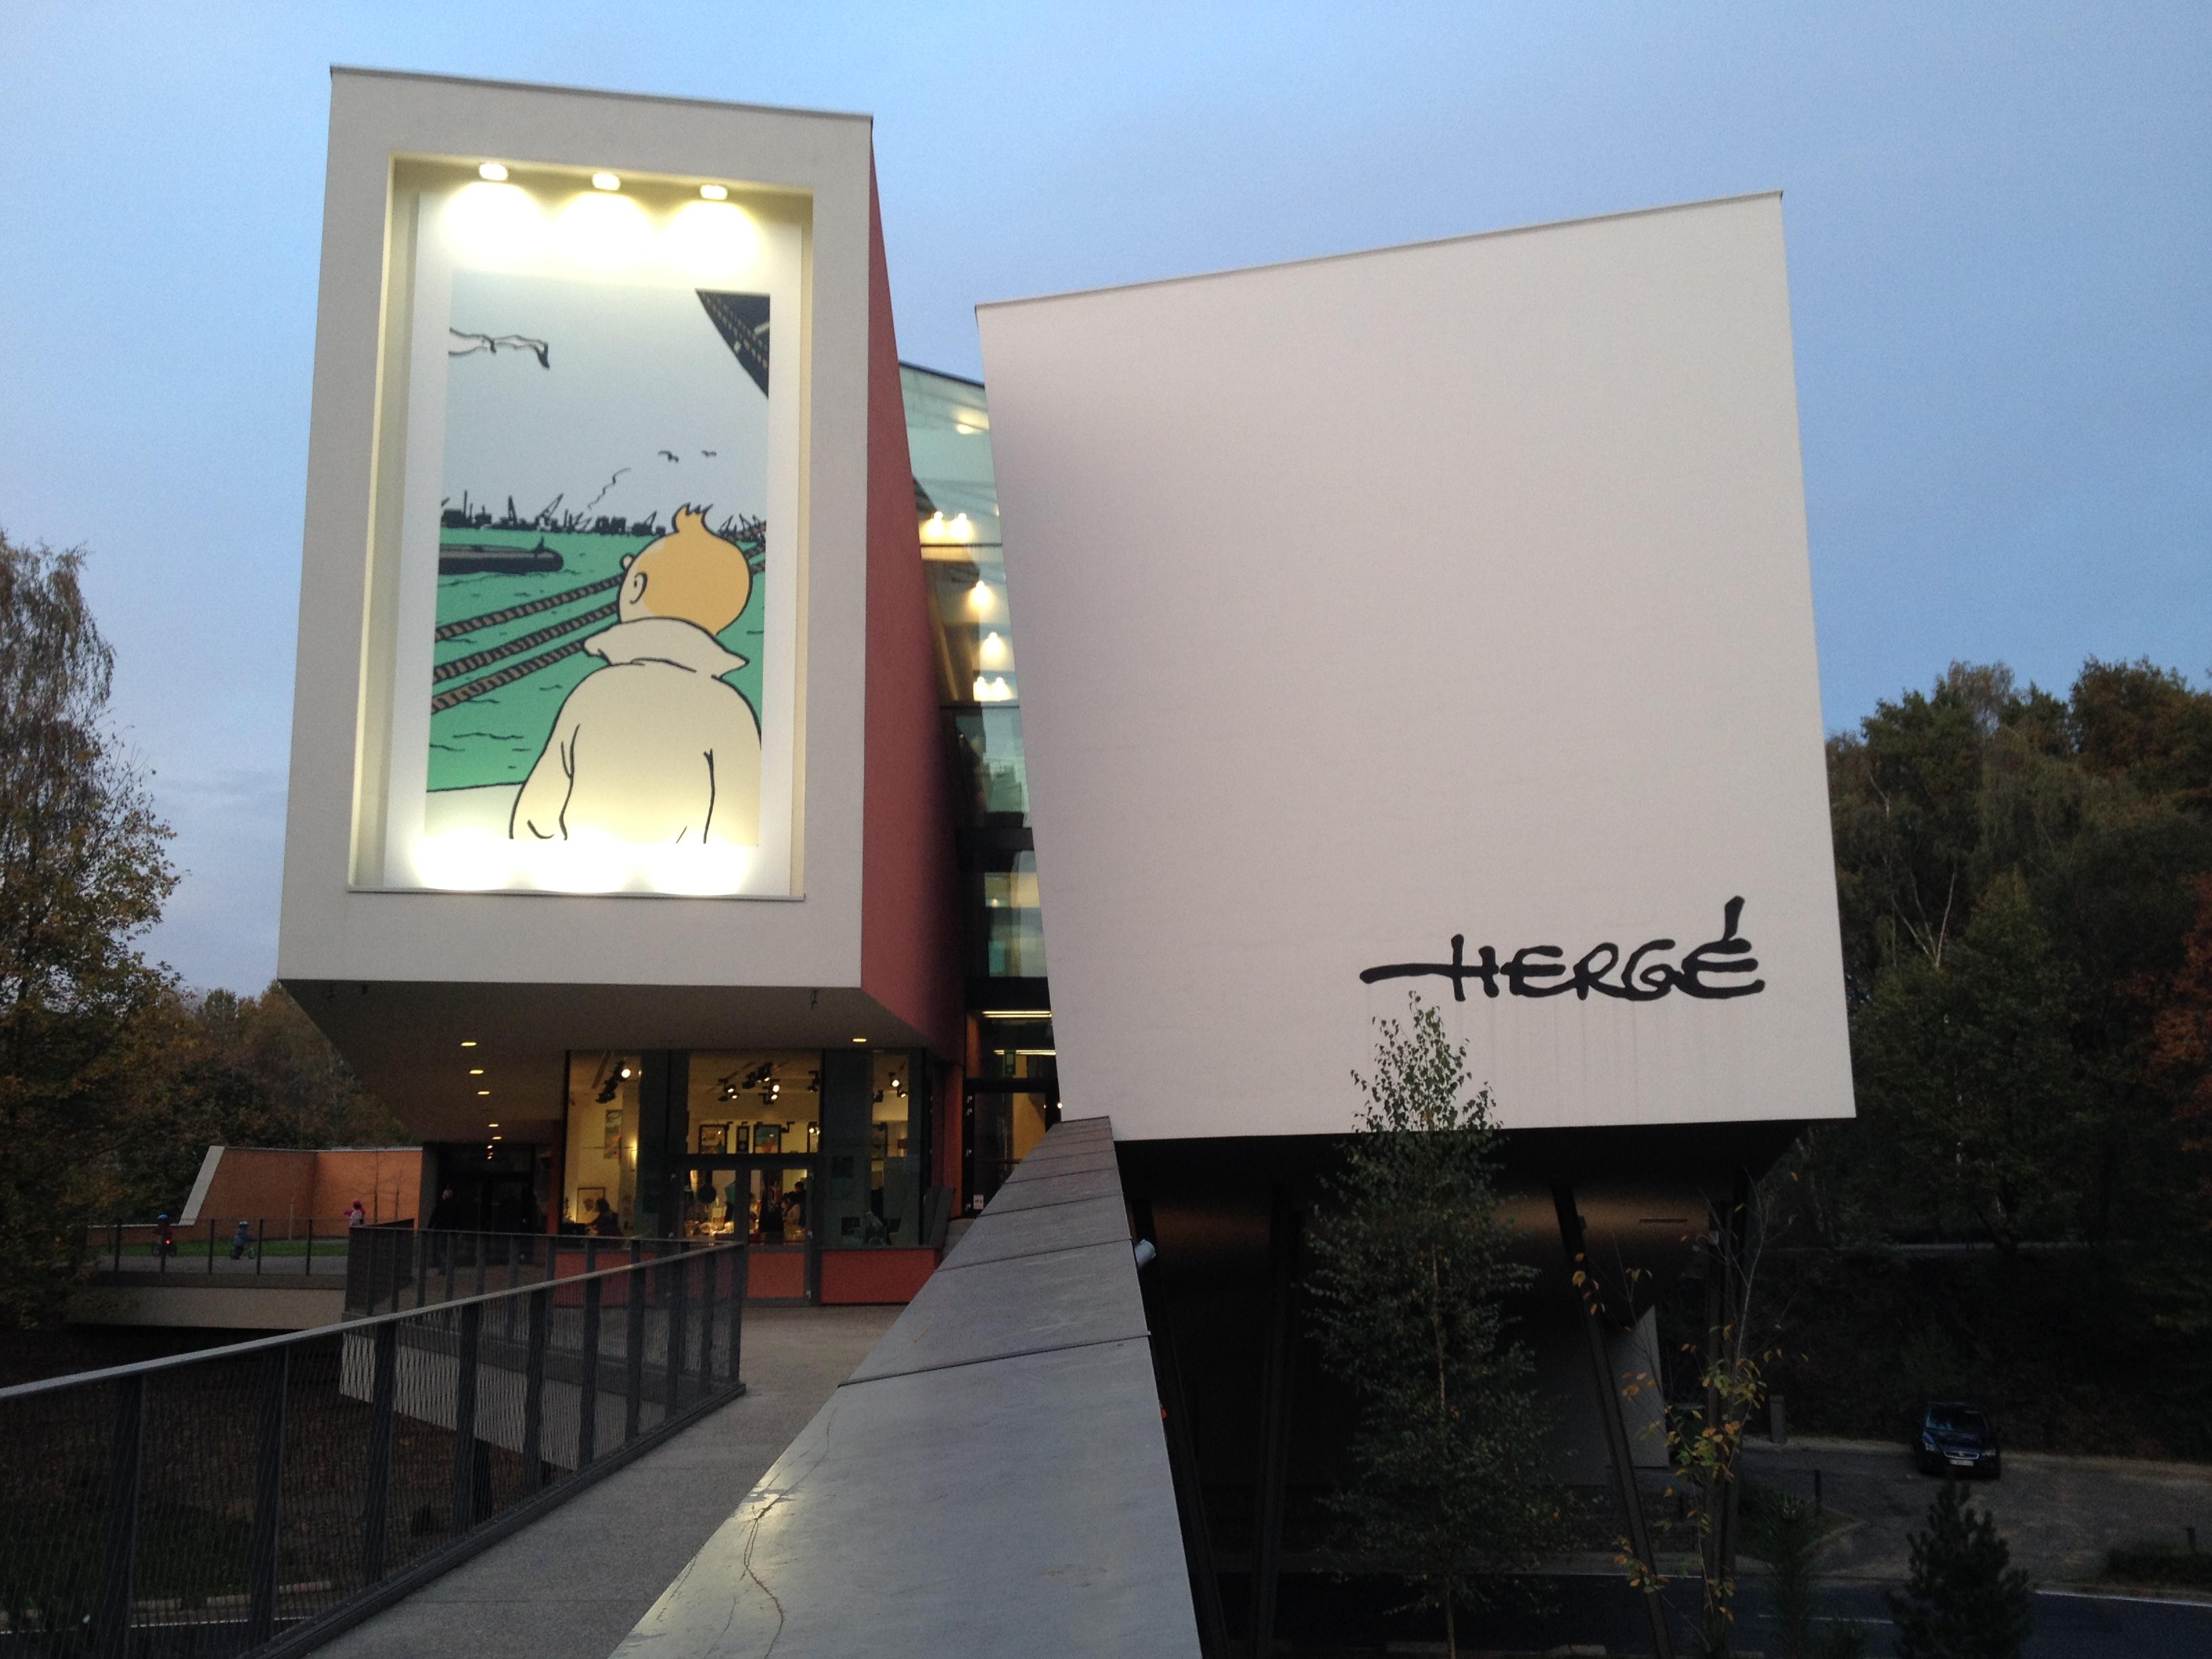 Musée Hergé - Louvain la Neuve - Tintin